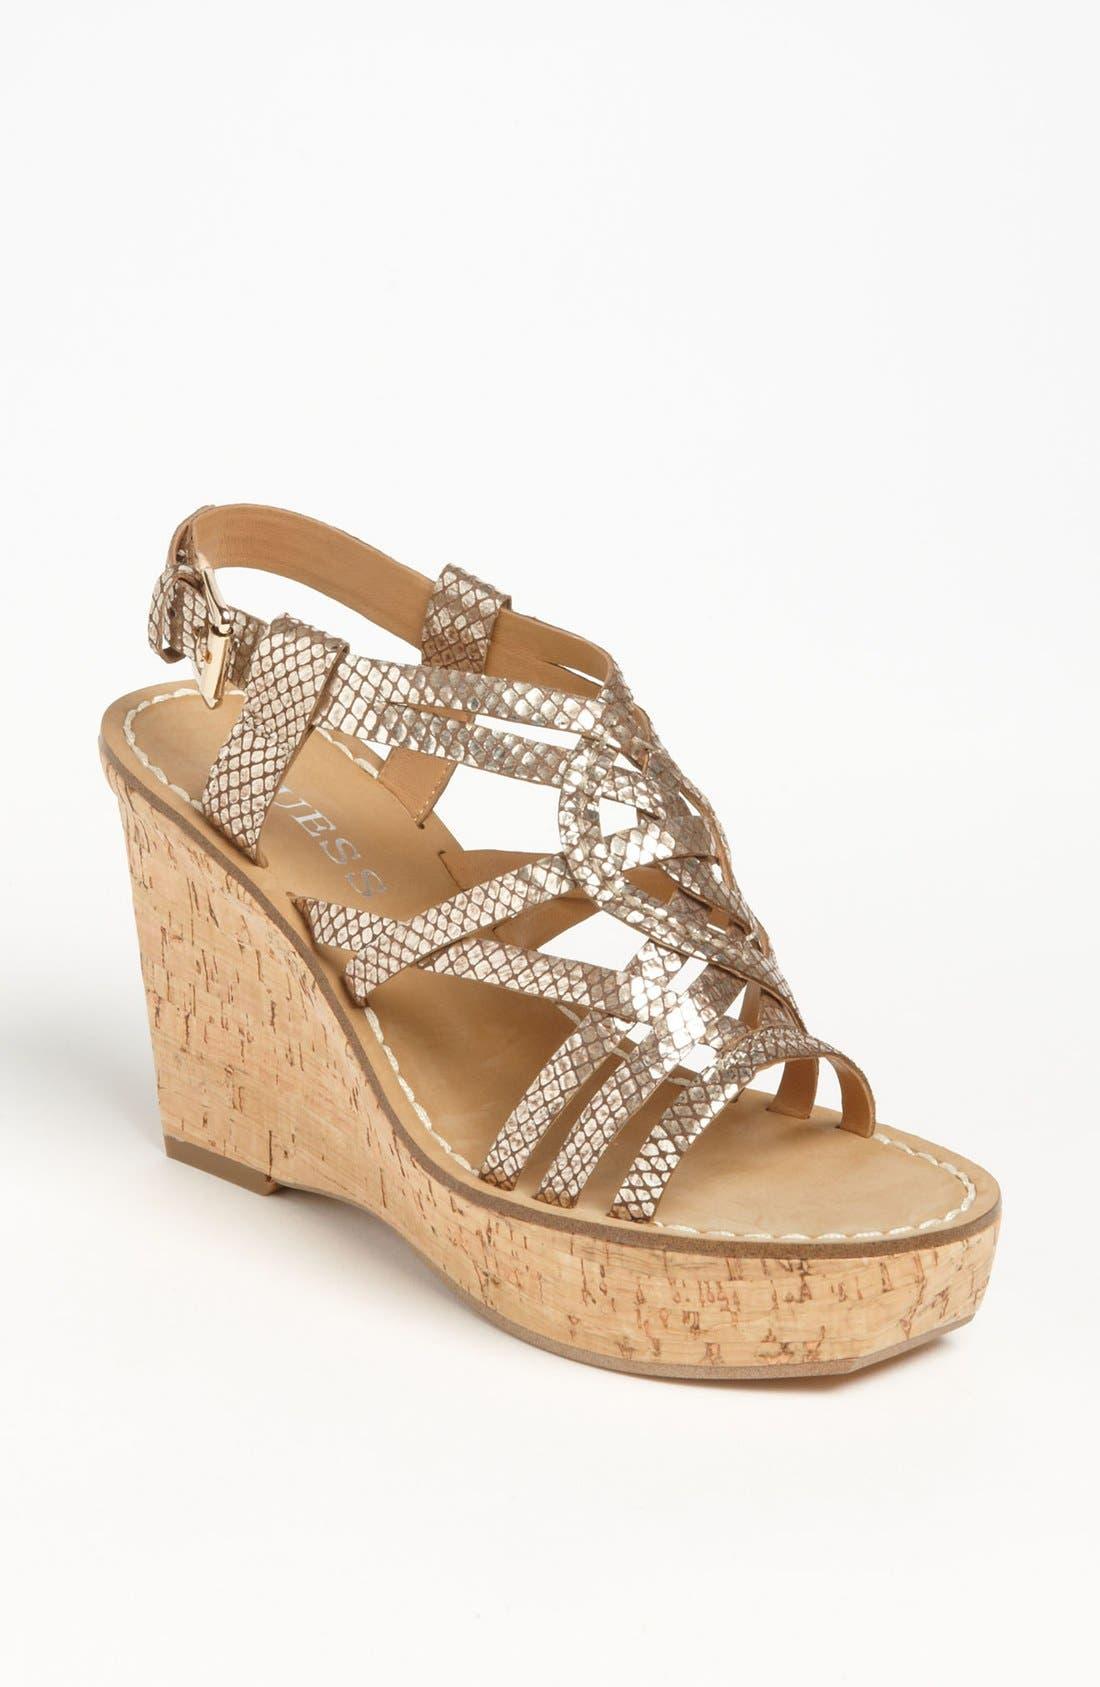 Alternate Image 1 Selected - GUESS 'Yarkena' Sandal